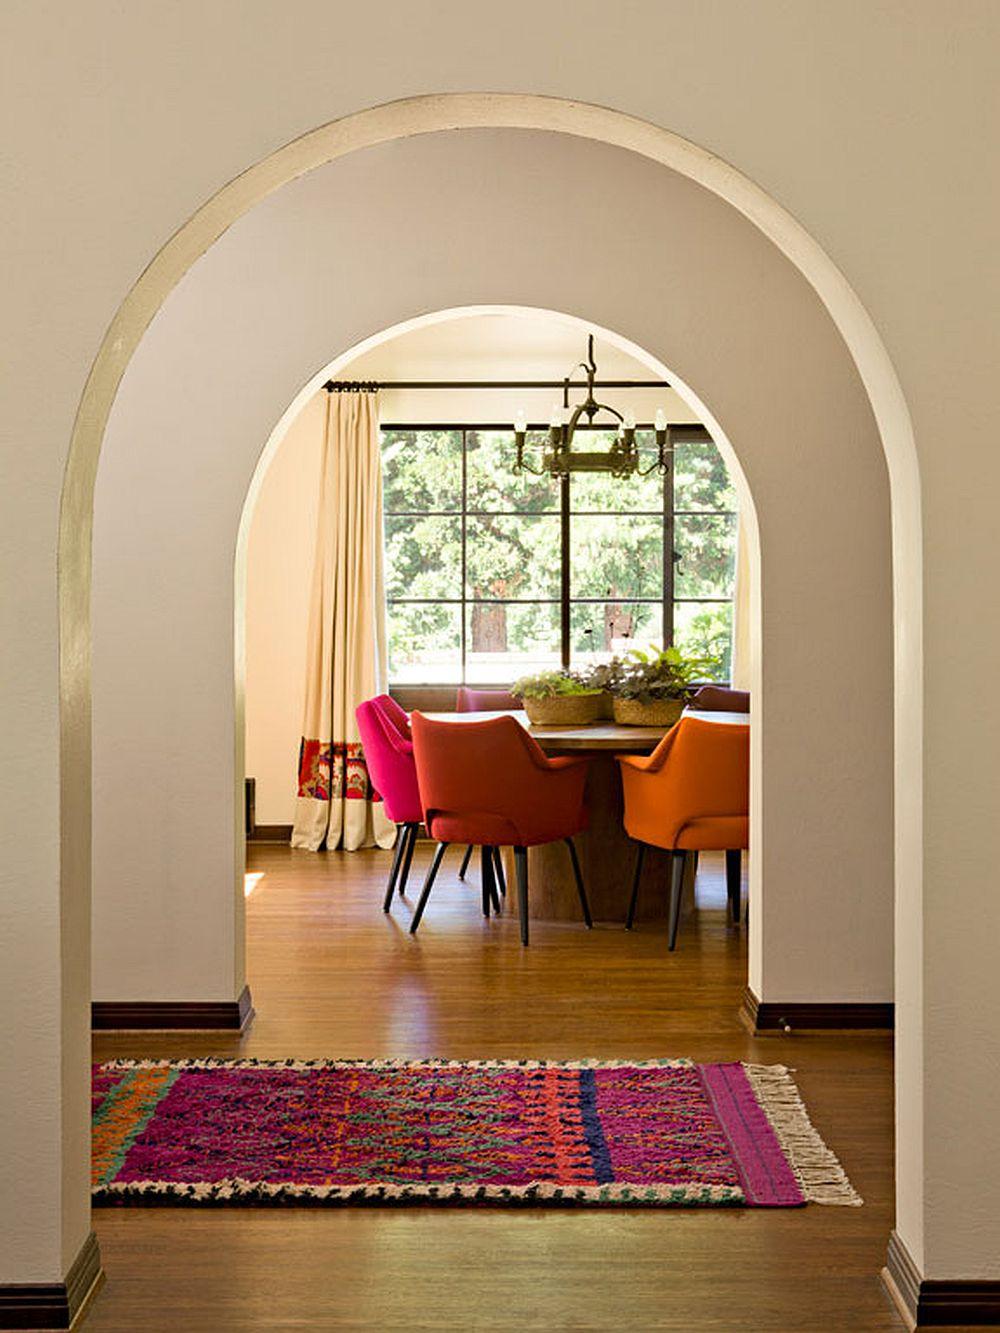 adelaparvu.com despre casa in stil mediteranean cu obiecte marocane, designer Jessica Helgerson, foto  Lincoln Barbour (3)